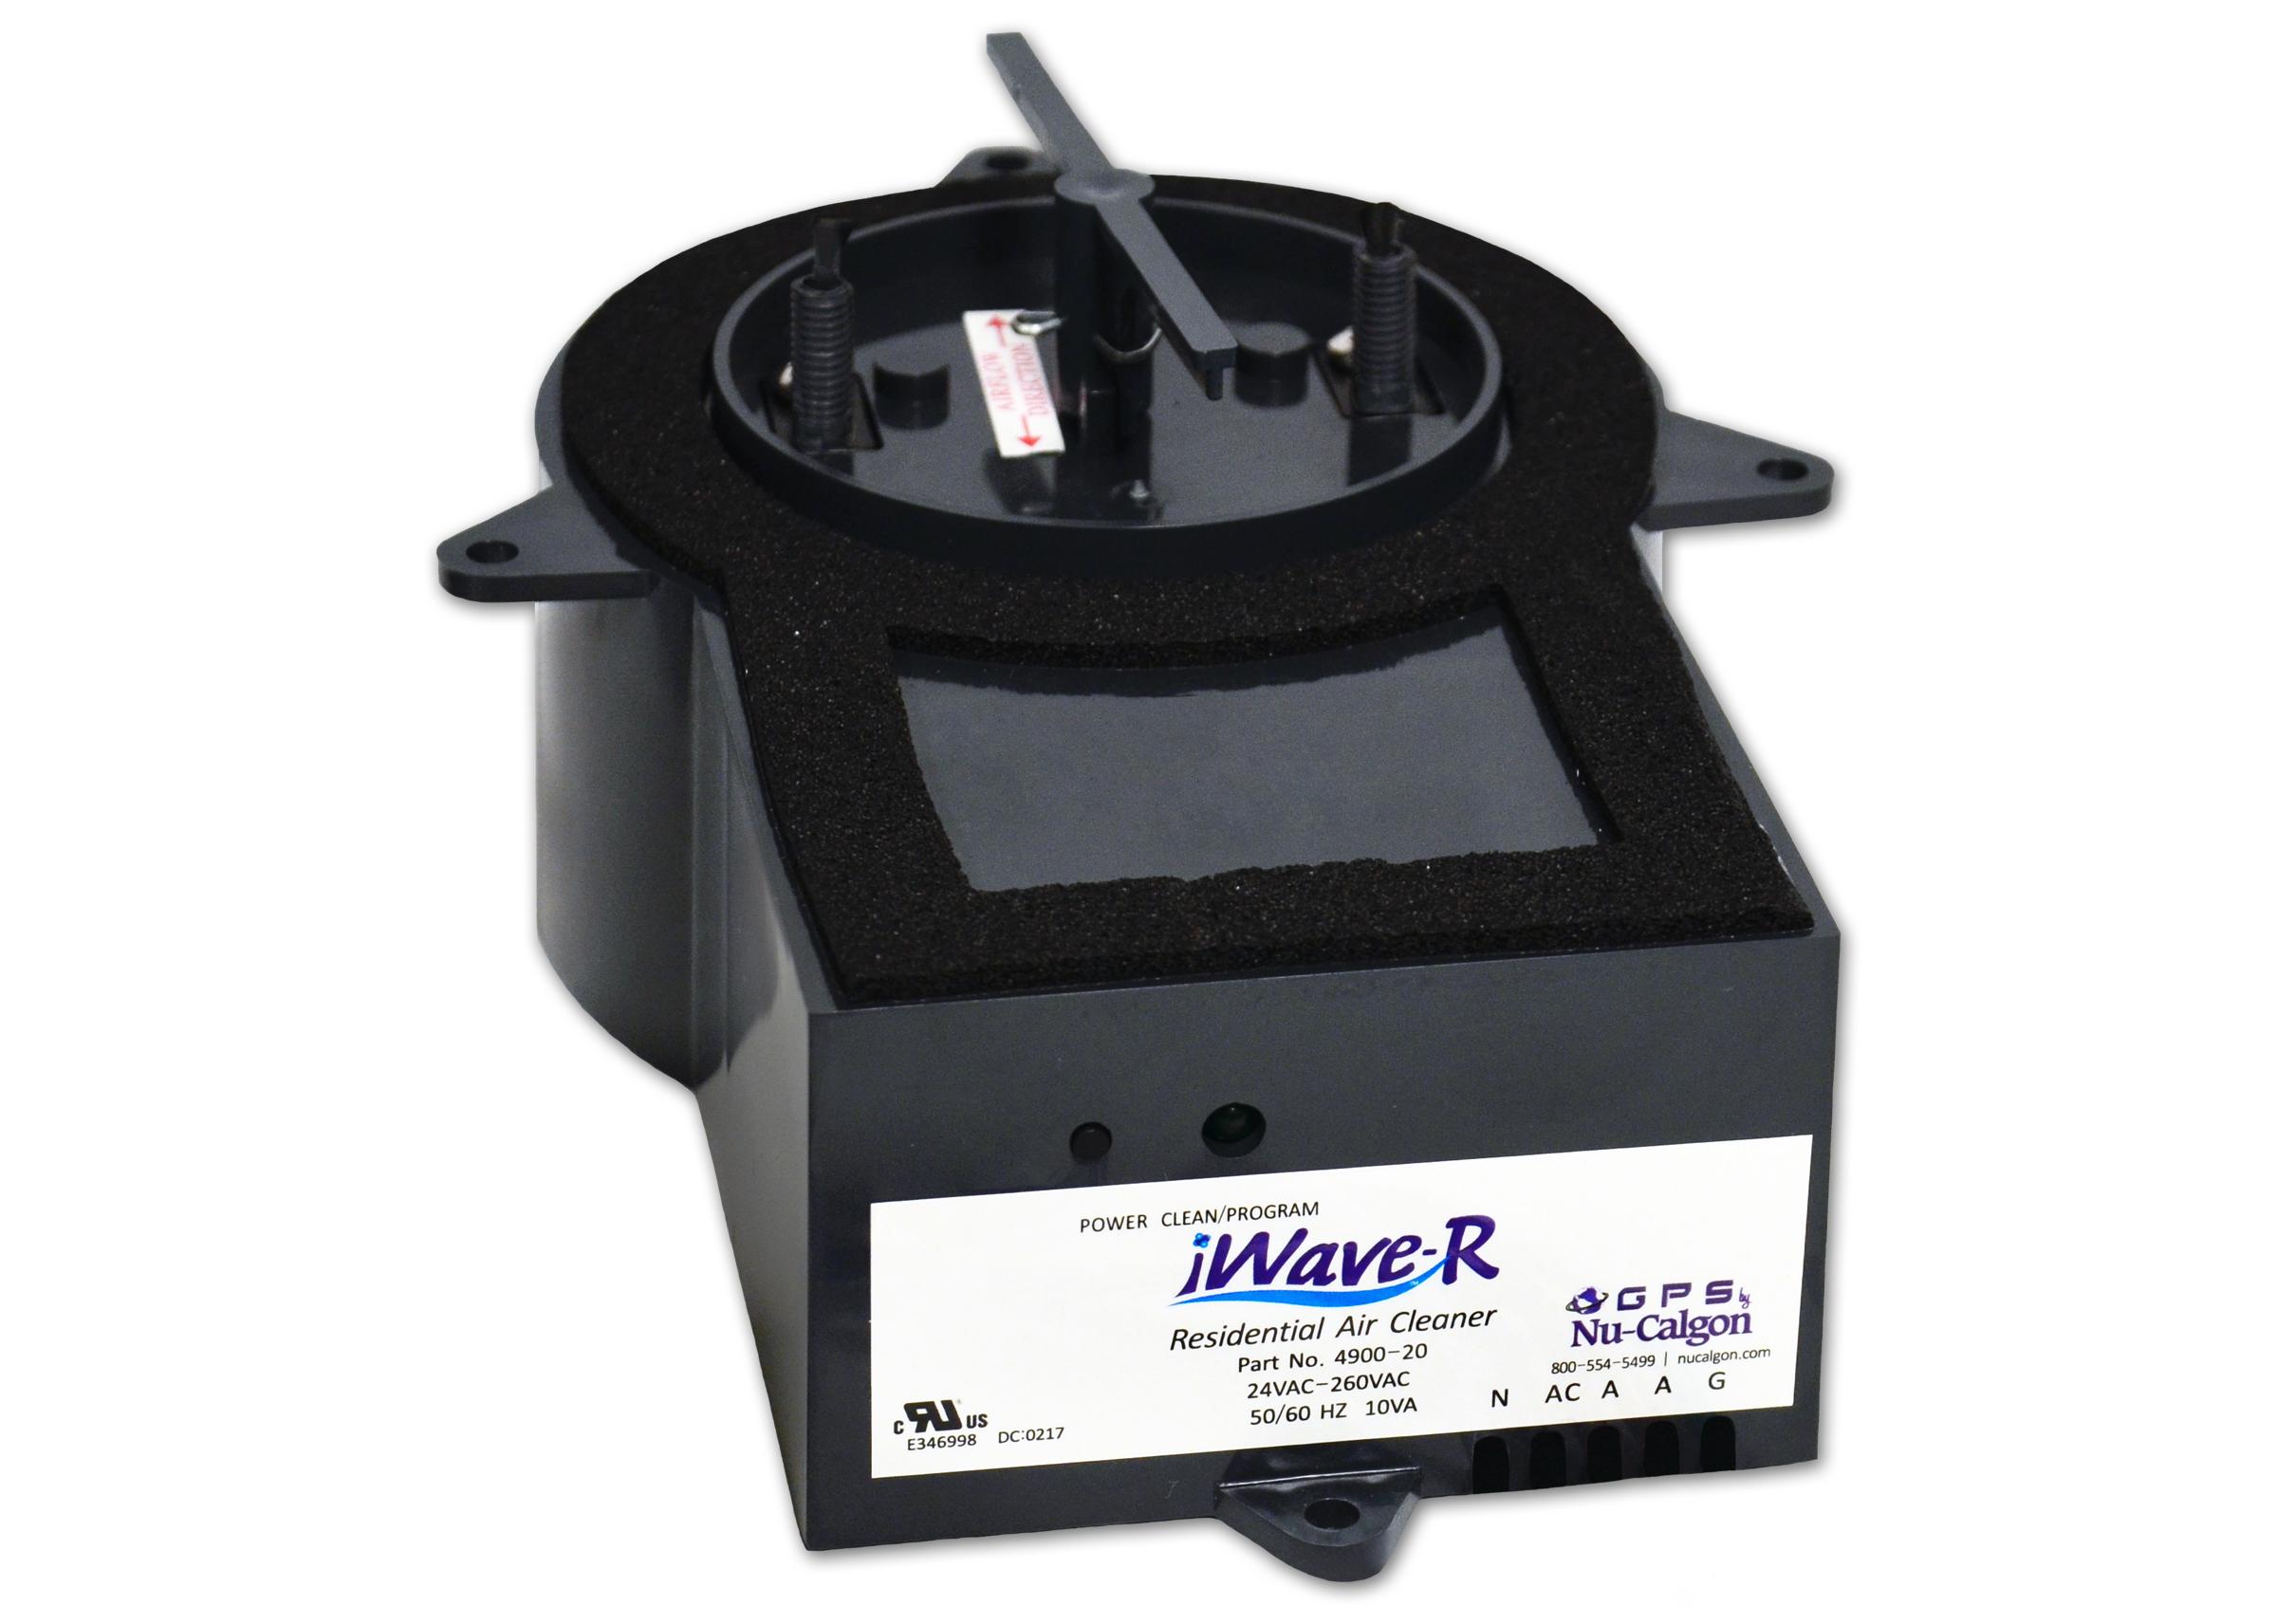 Nu-Calgon iWave-R Air Purifier 4900-20